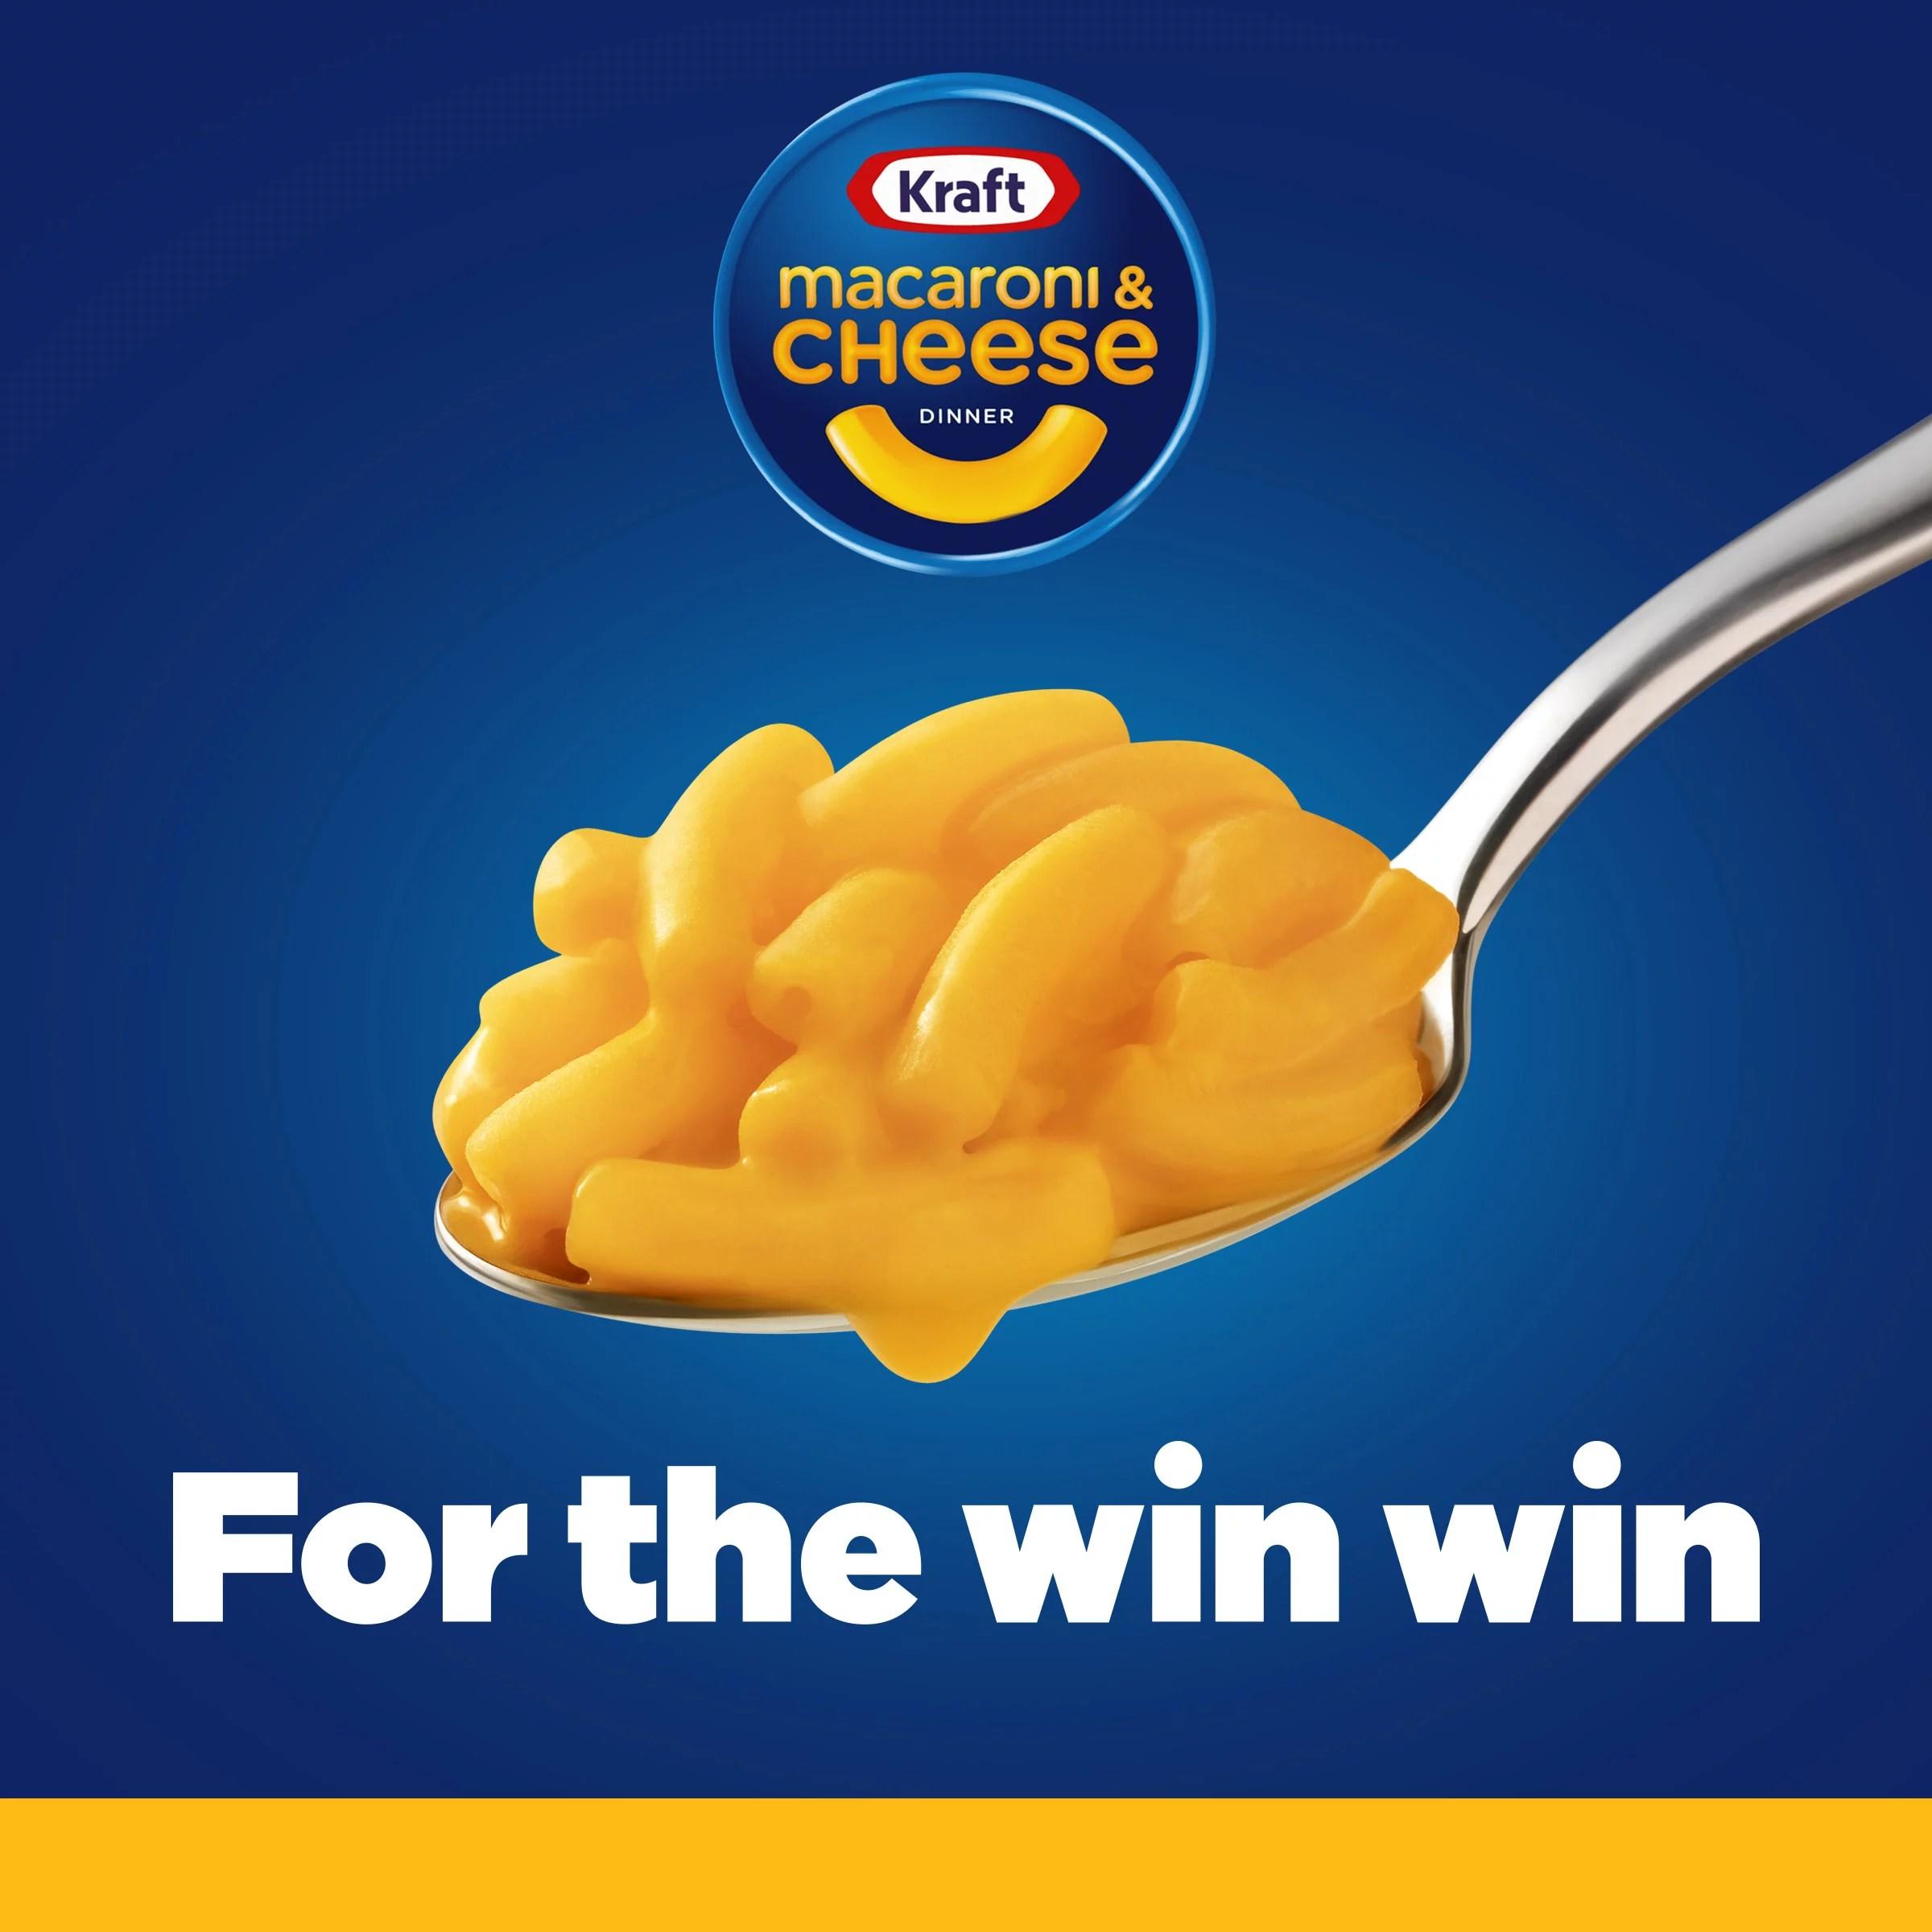 kraft original macaroni cheese easy microwavable dinner 4 ct pack 2 05 oz cups